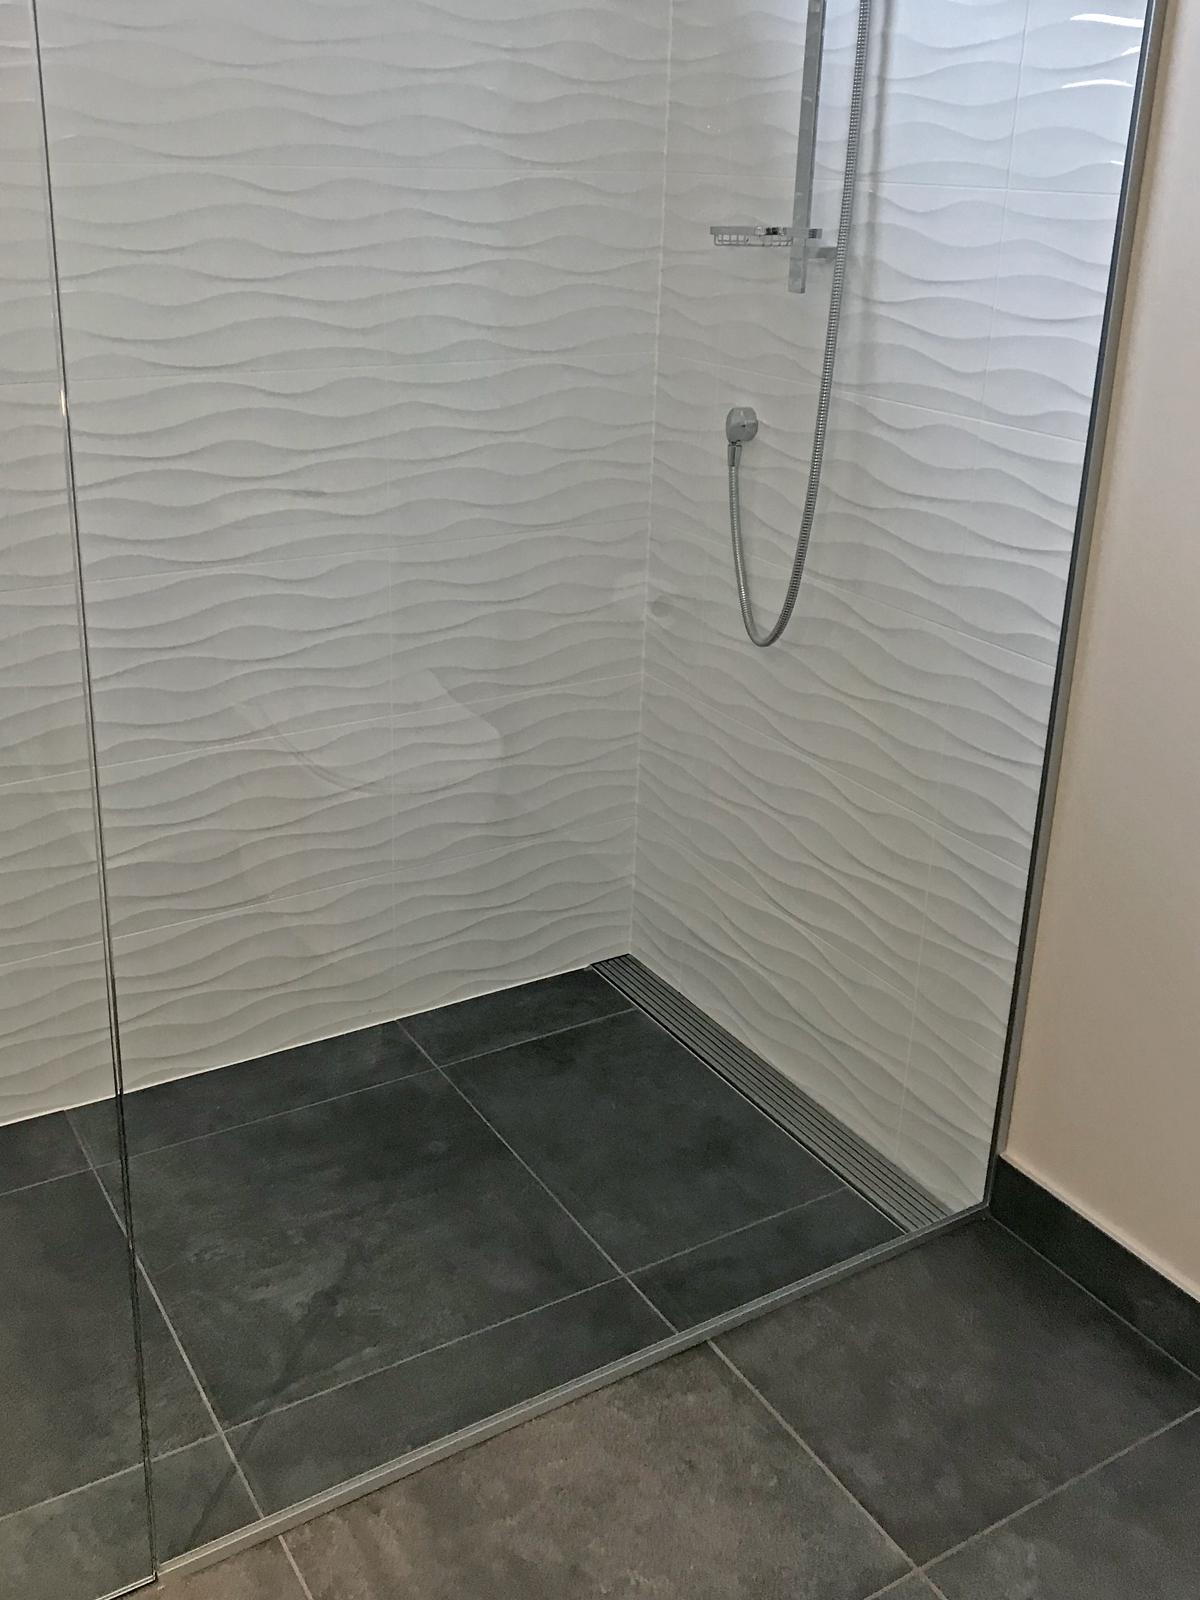 showerchannel_180430_4.jpg